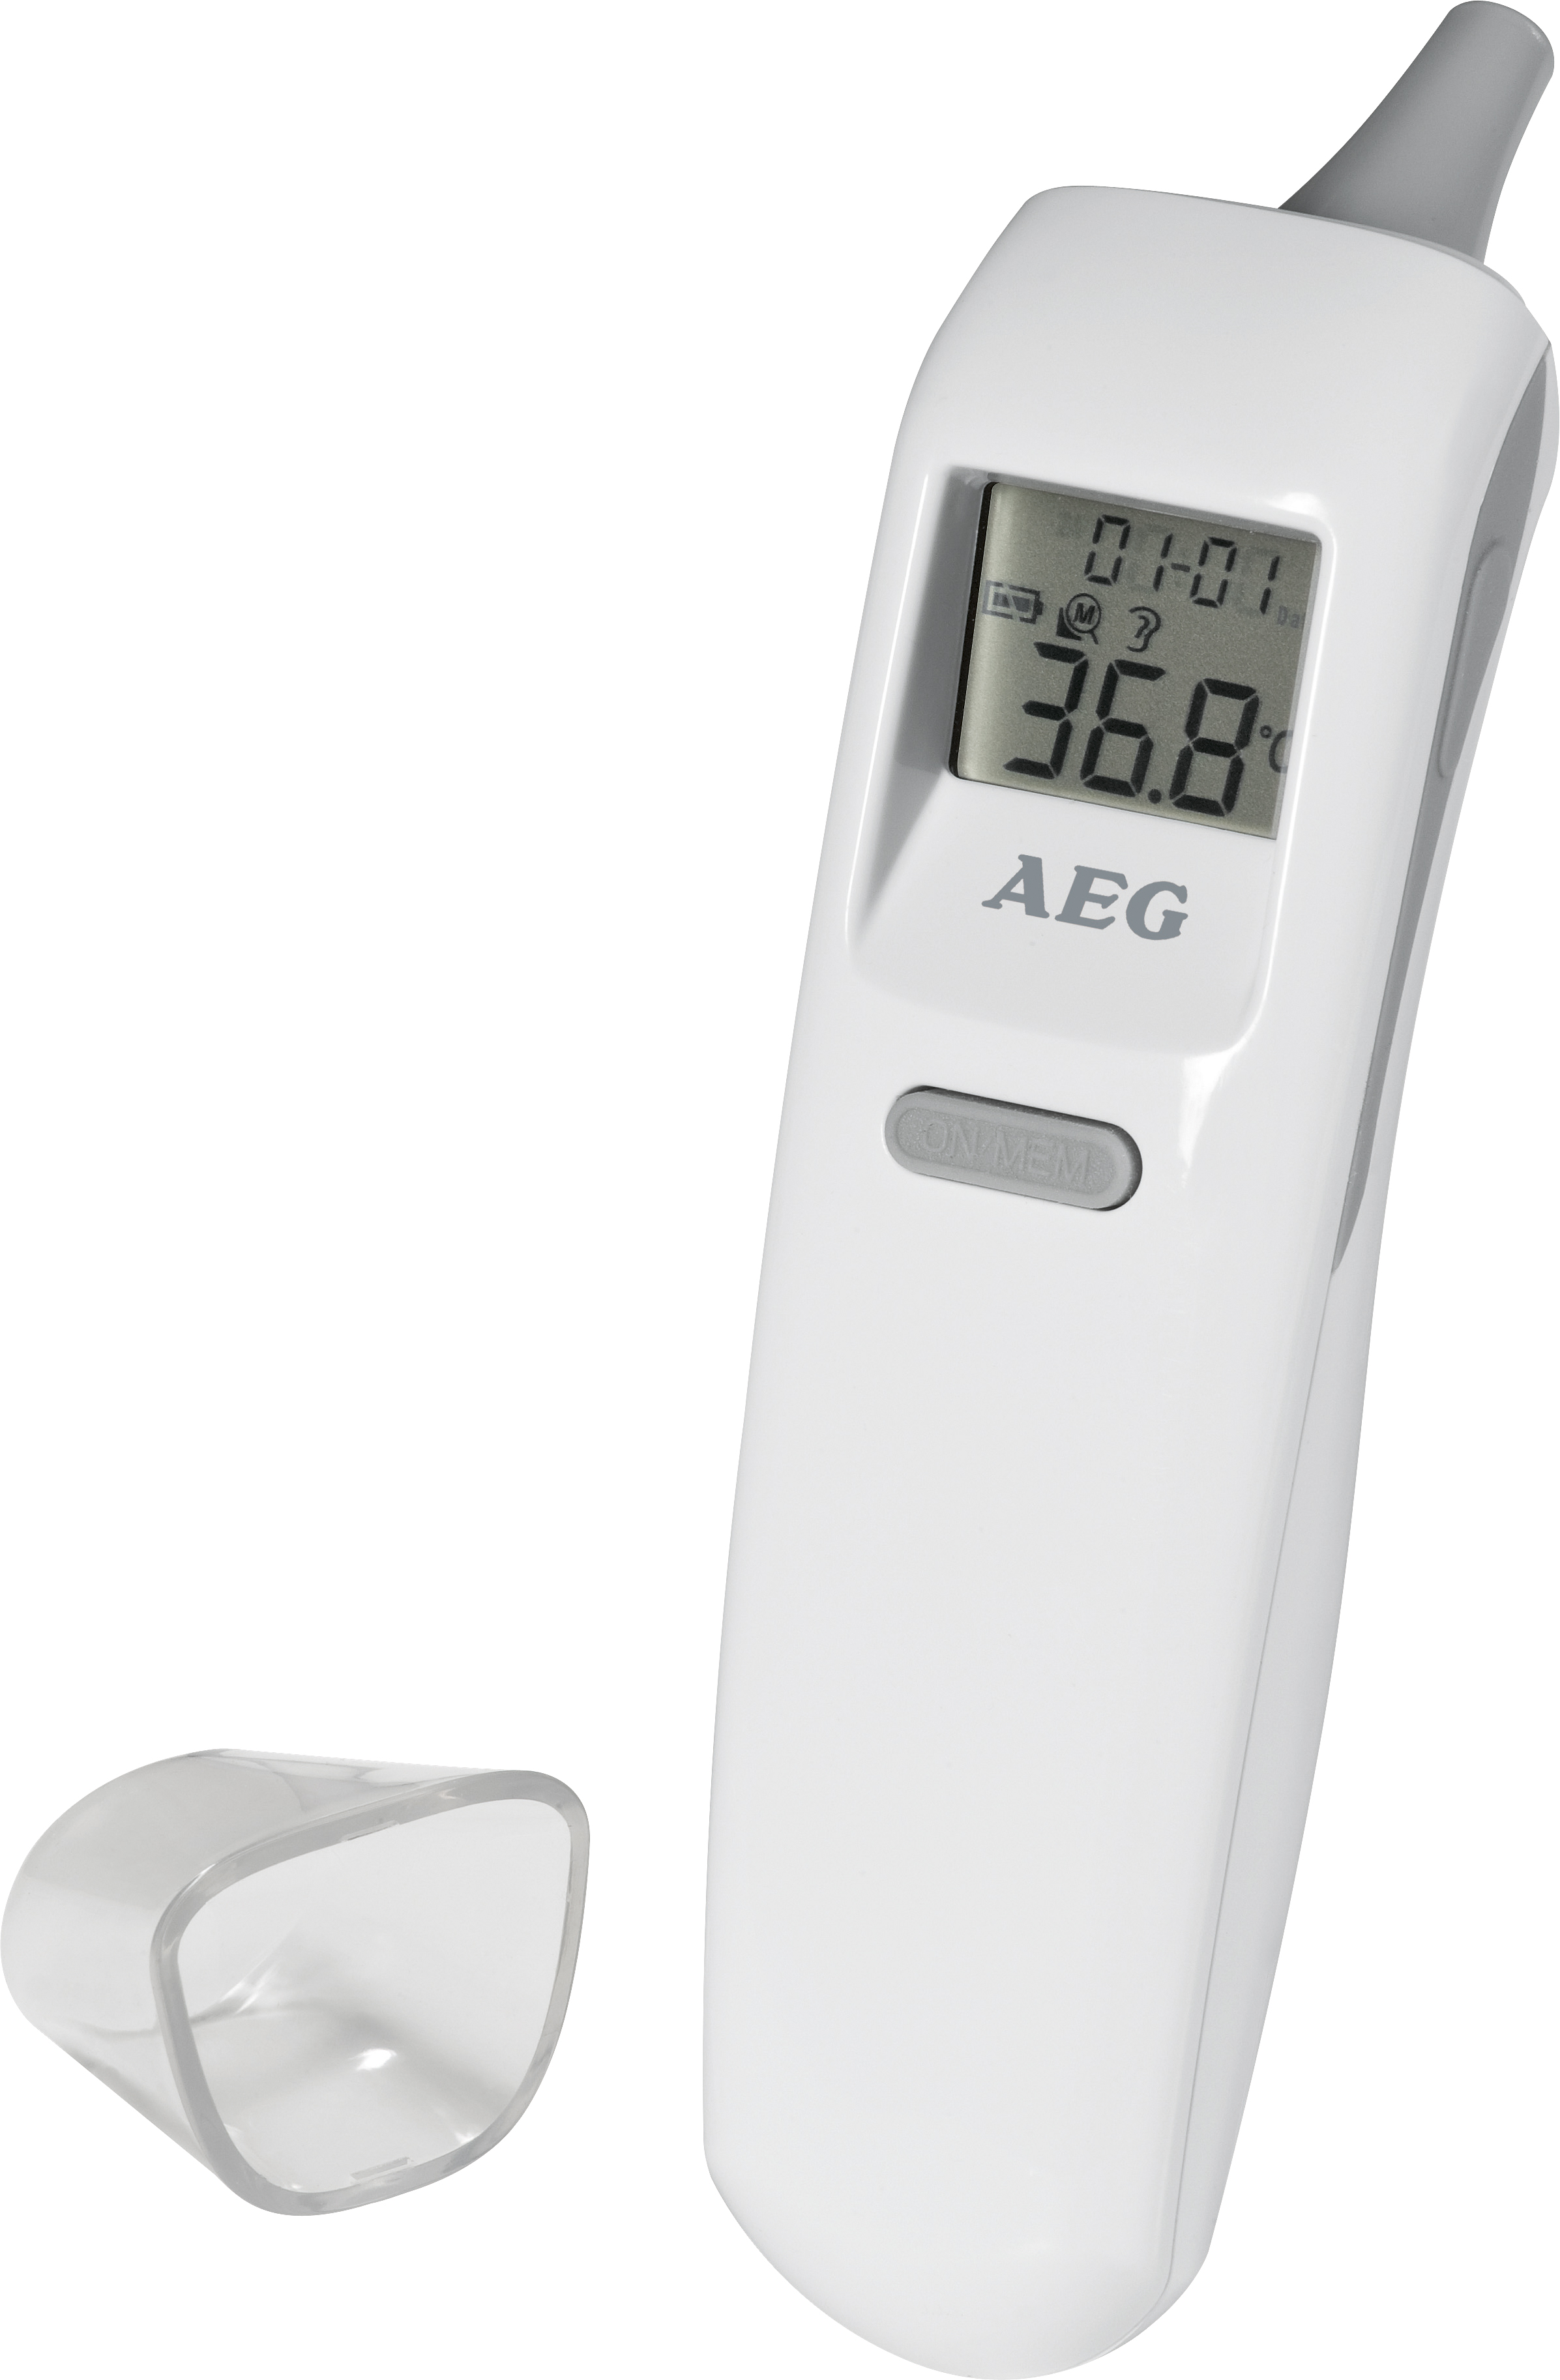 AEG FT 4919 - Αυτιού | Ιατρικά Ορθοπεδικά Είδη